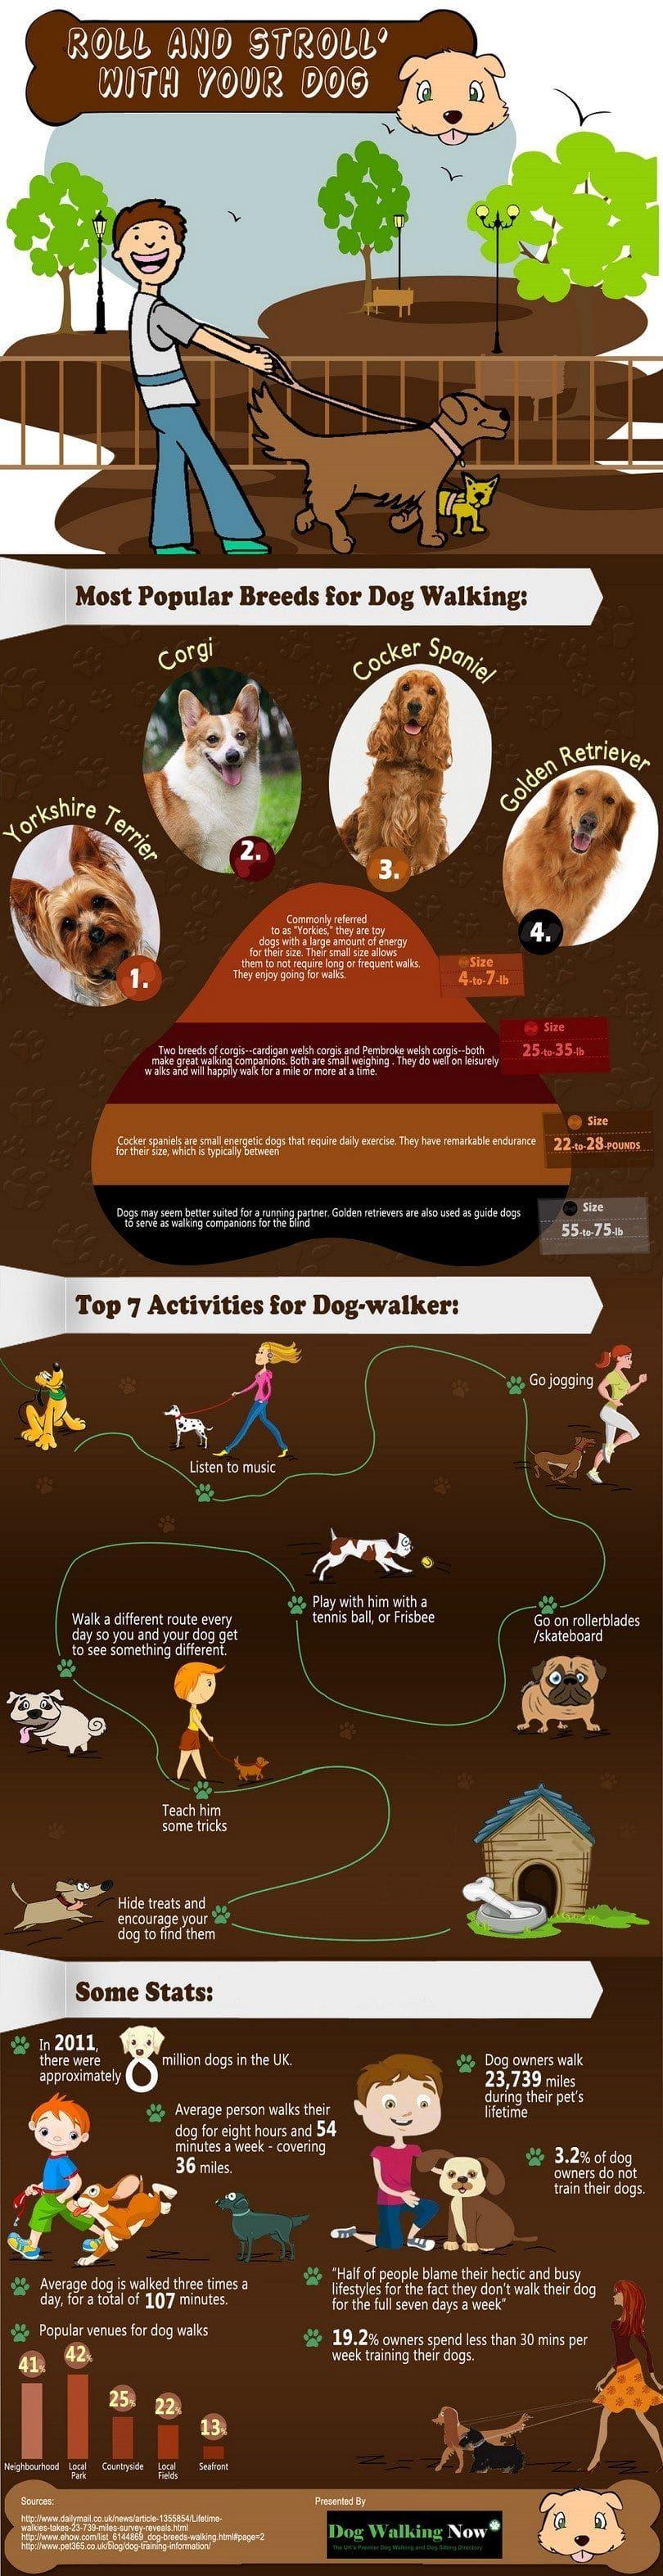 Rollo de paseo con su perro